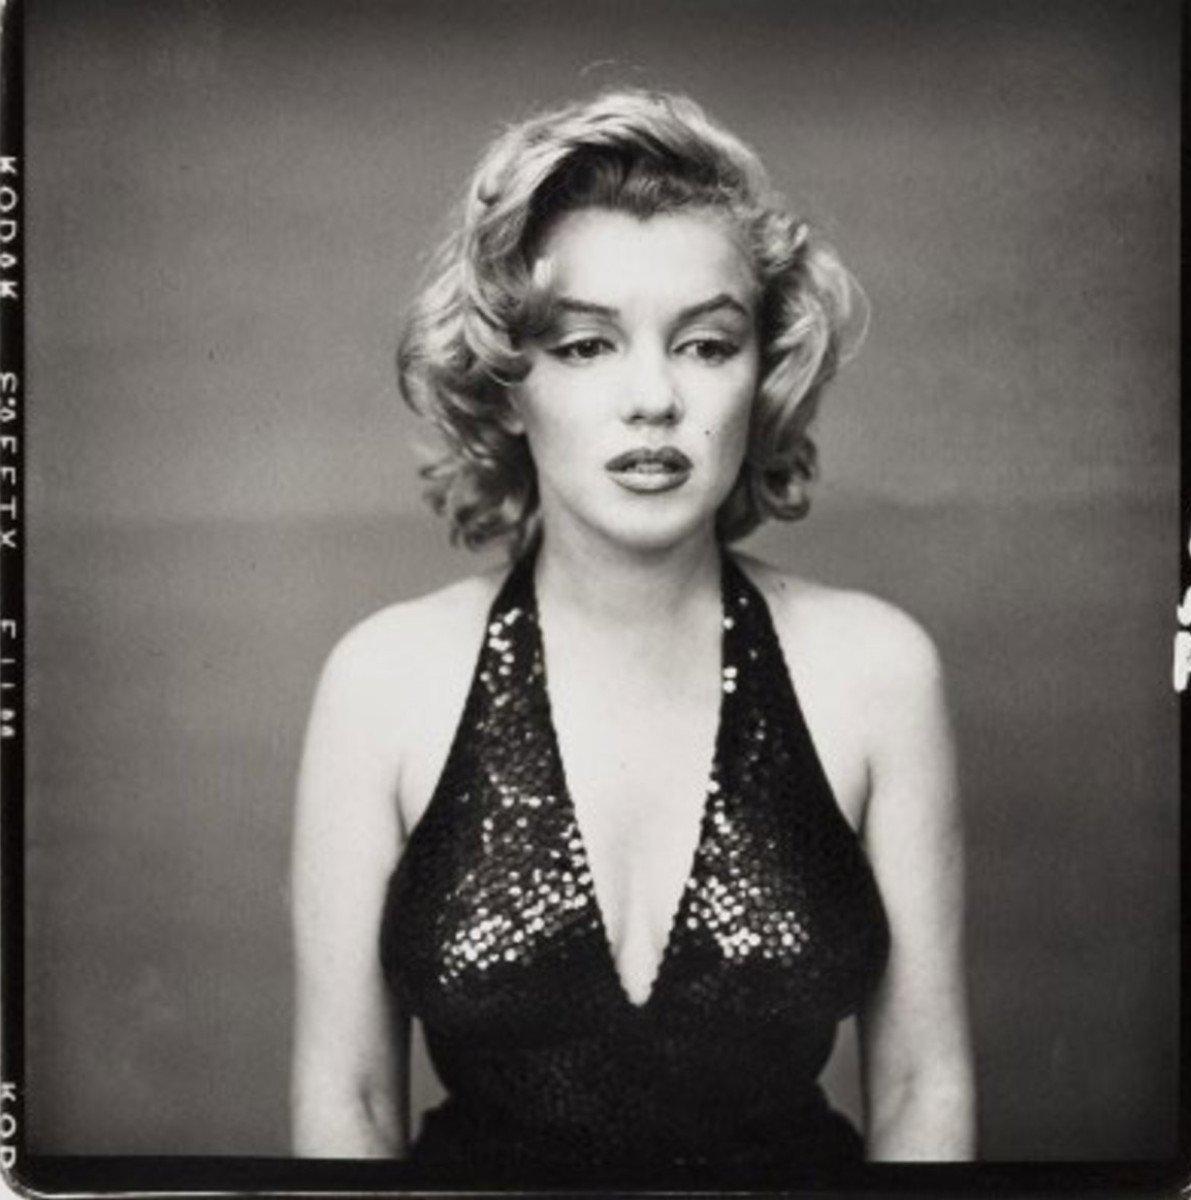 Marilyn Monroe, New York, May 6, 1957 © Richard Avedon